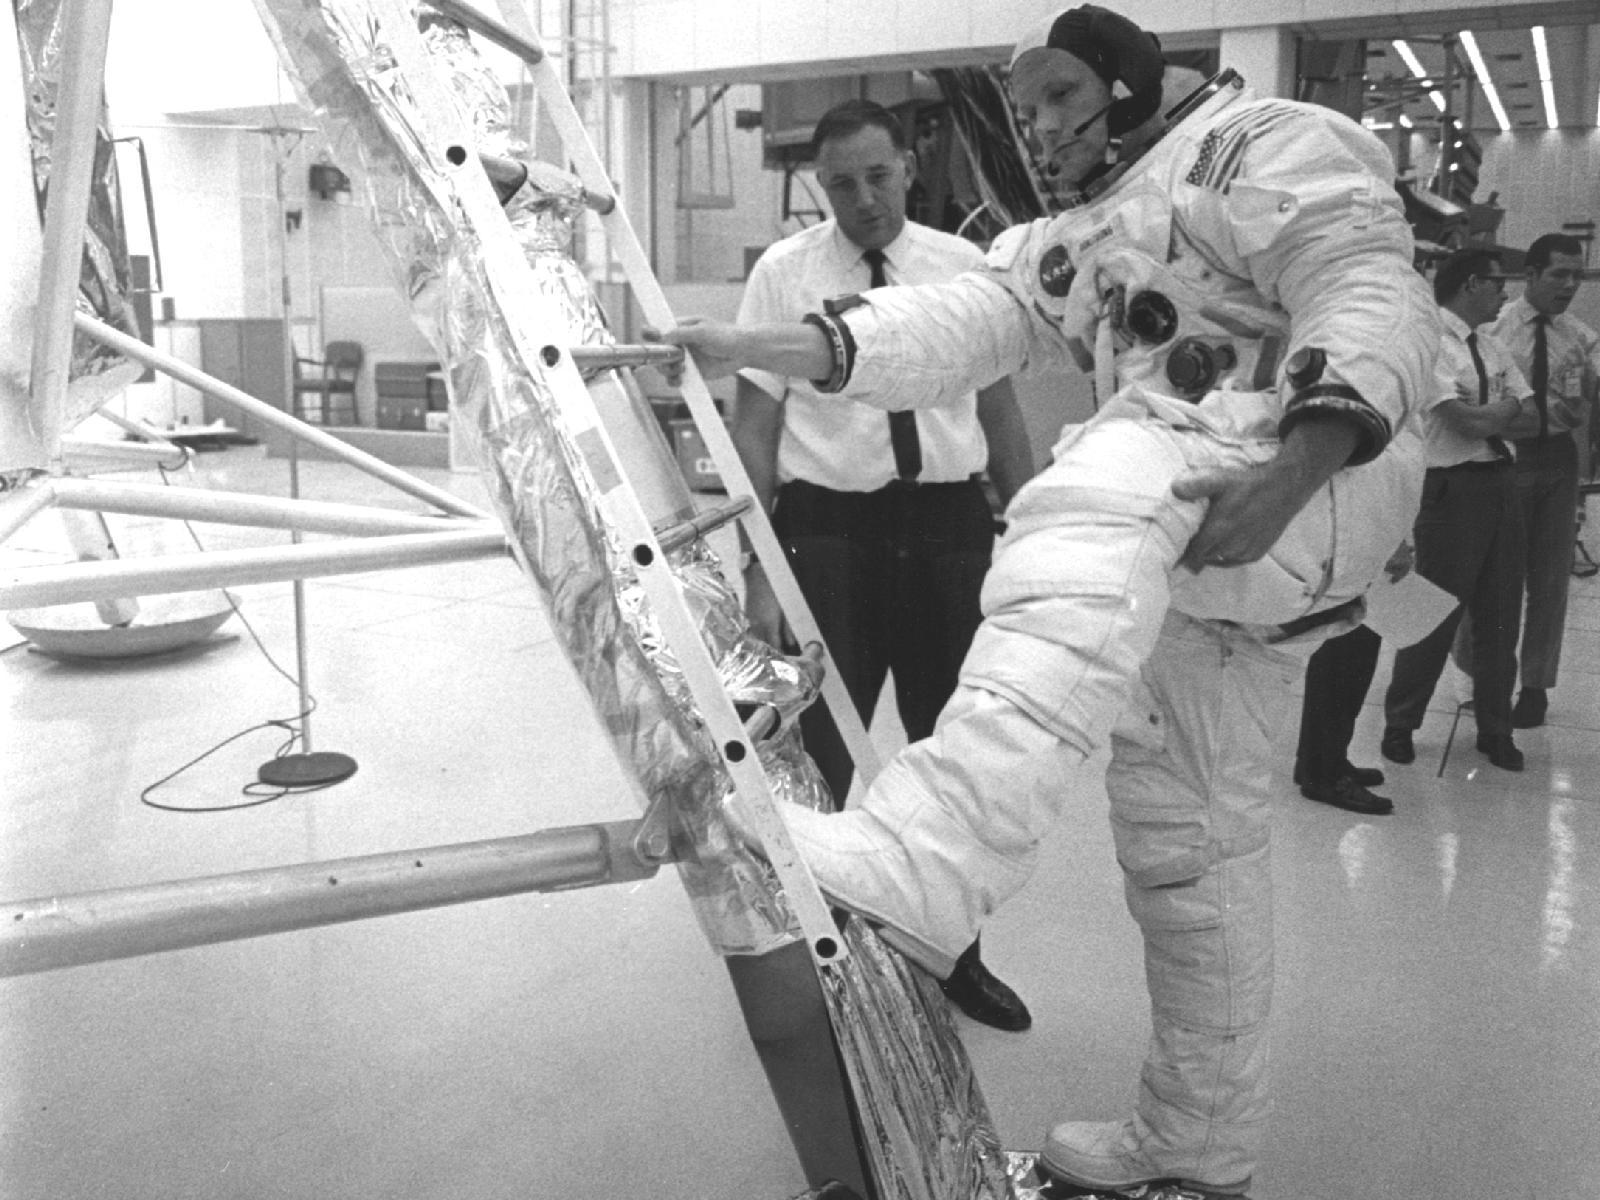 Neil Armstrong's Moonwalk Training